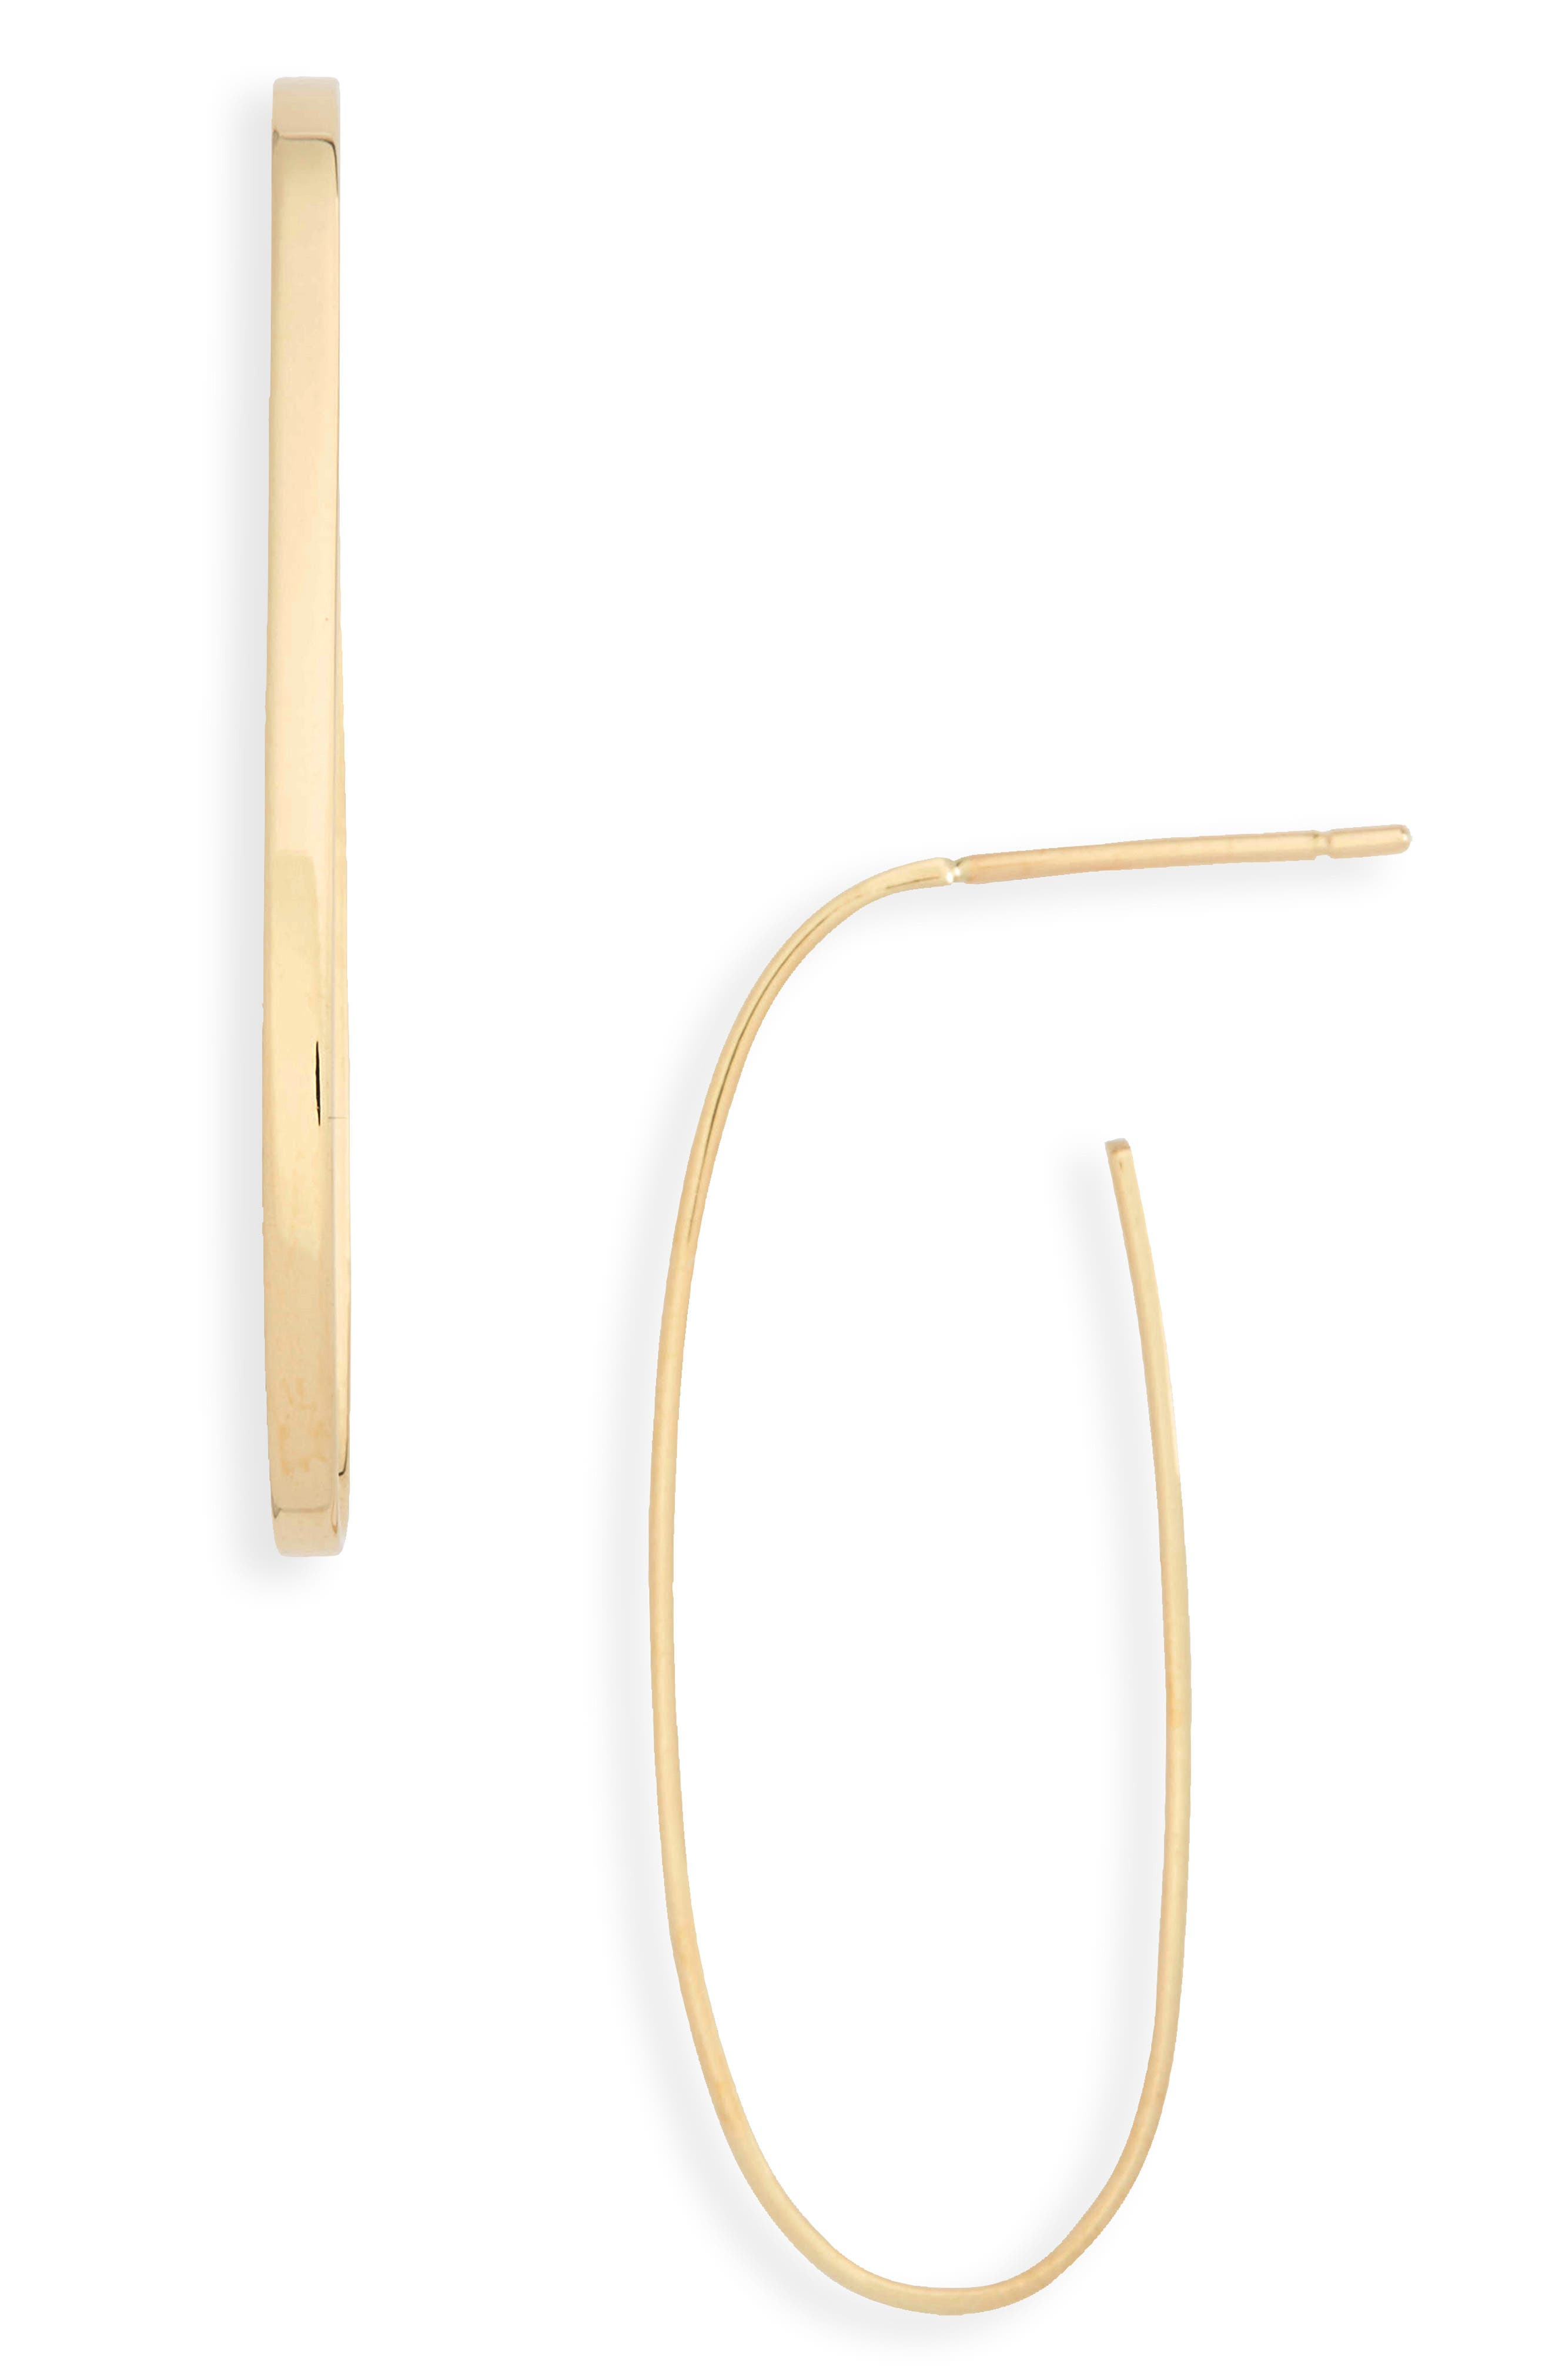 Flat Long Oval Hoop Earrings,                             Main thumbnail 1, color,                             YELLOW GOLD